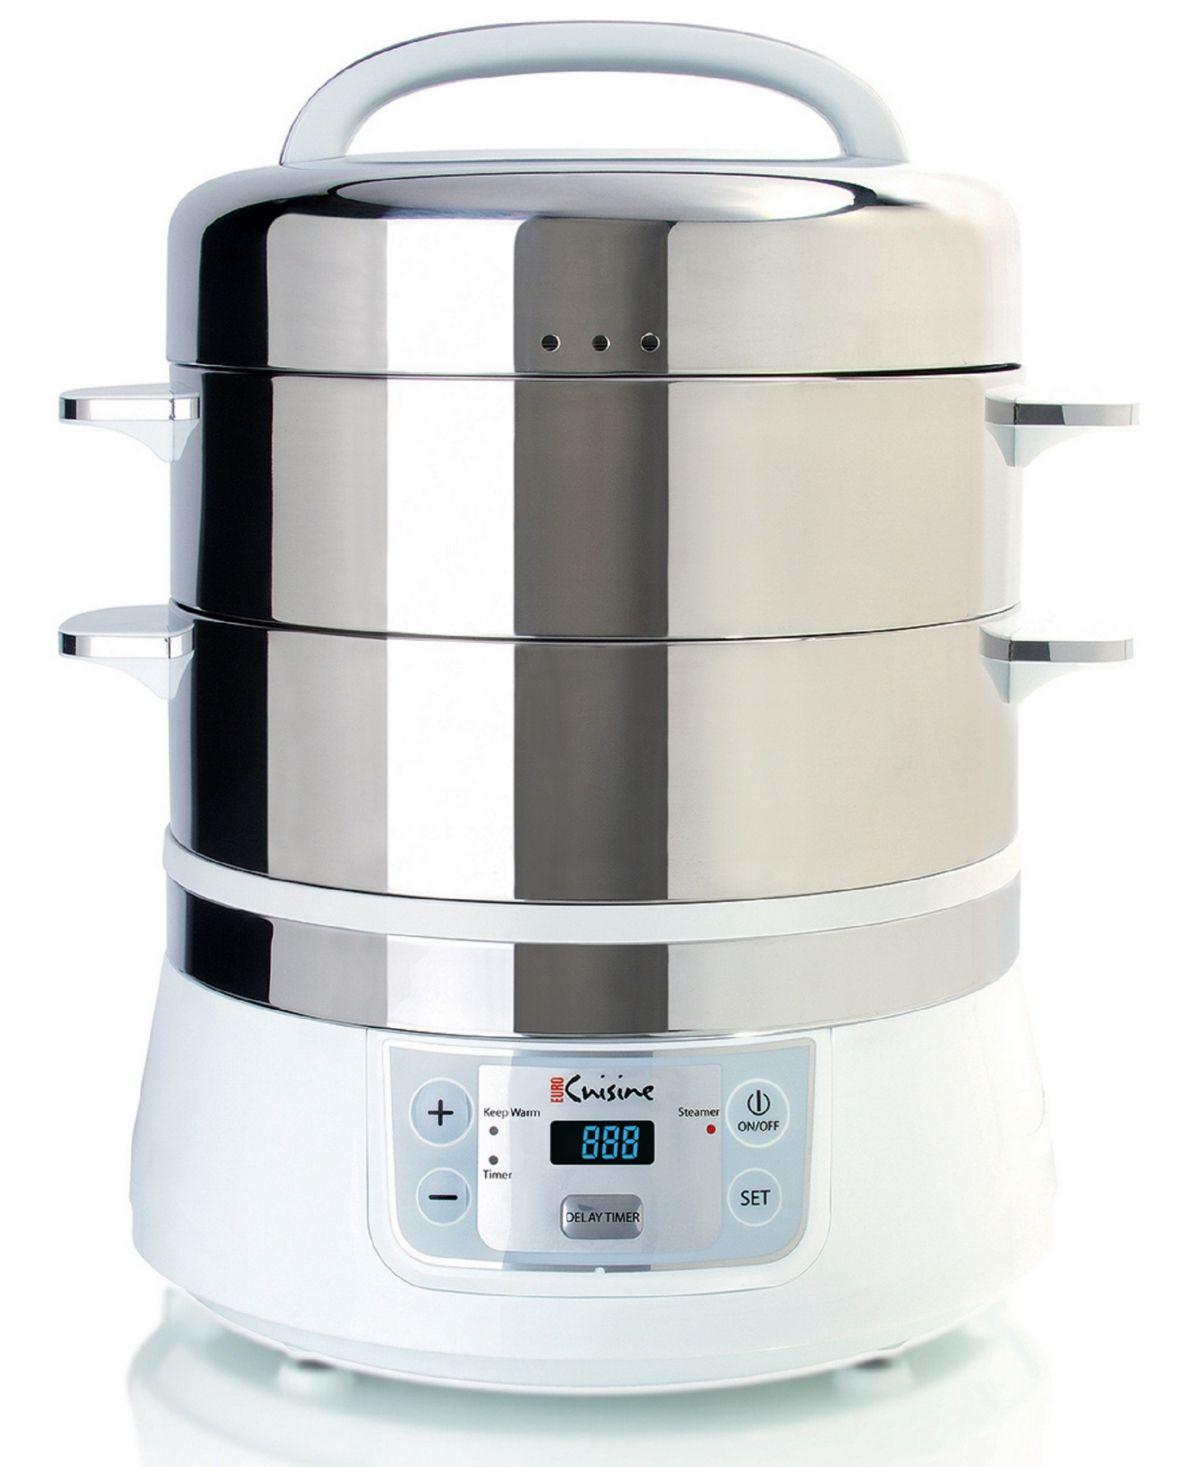 Eurocuisine Euro Cuisine Fs2500 Stainless Steel Electric Food Steamer Reviews Small Appliances Kitchen